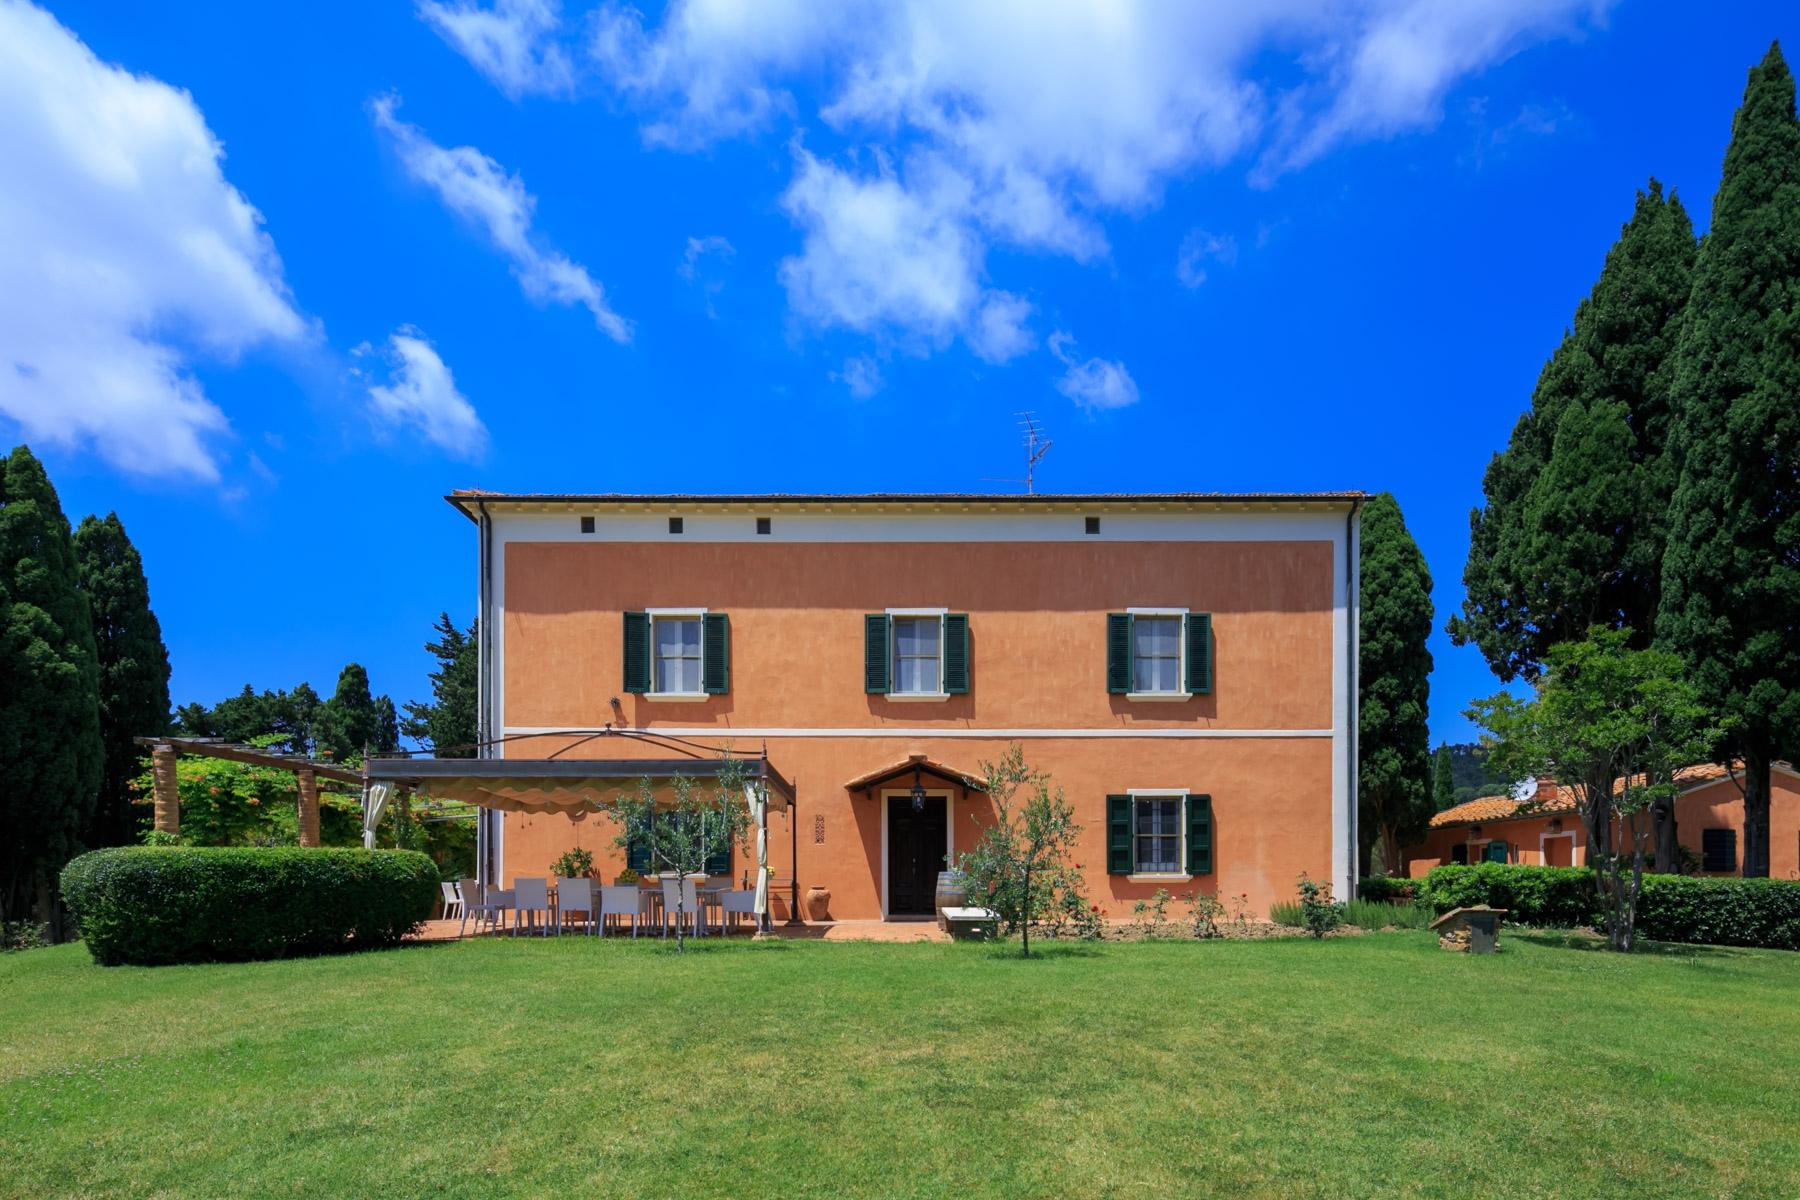 Villa in Vendita a Campiglia Marittima: 5 locali, 1100 mq - Foto 6